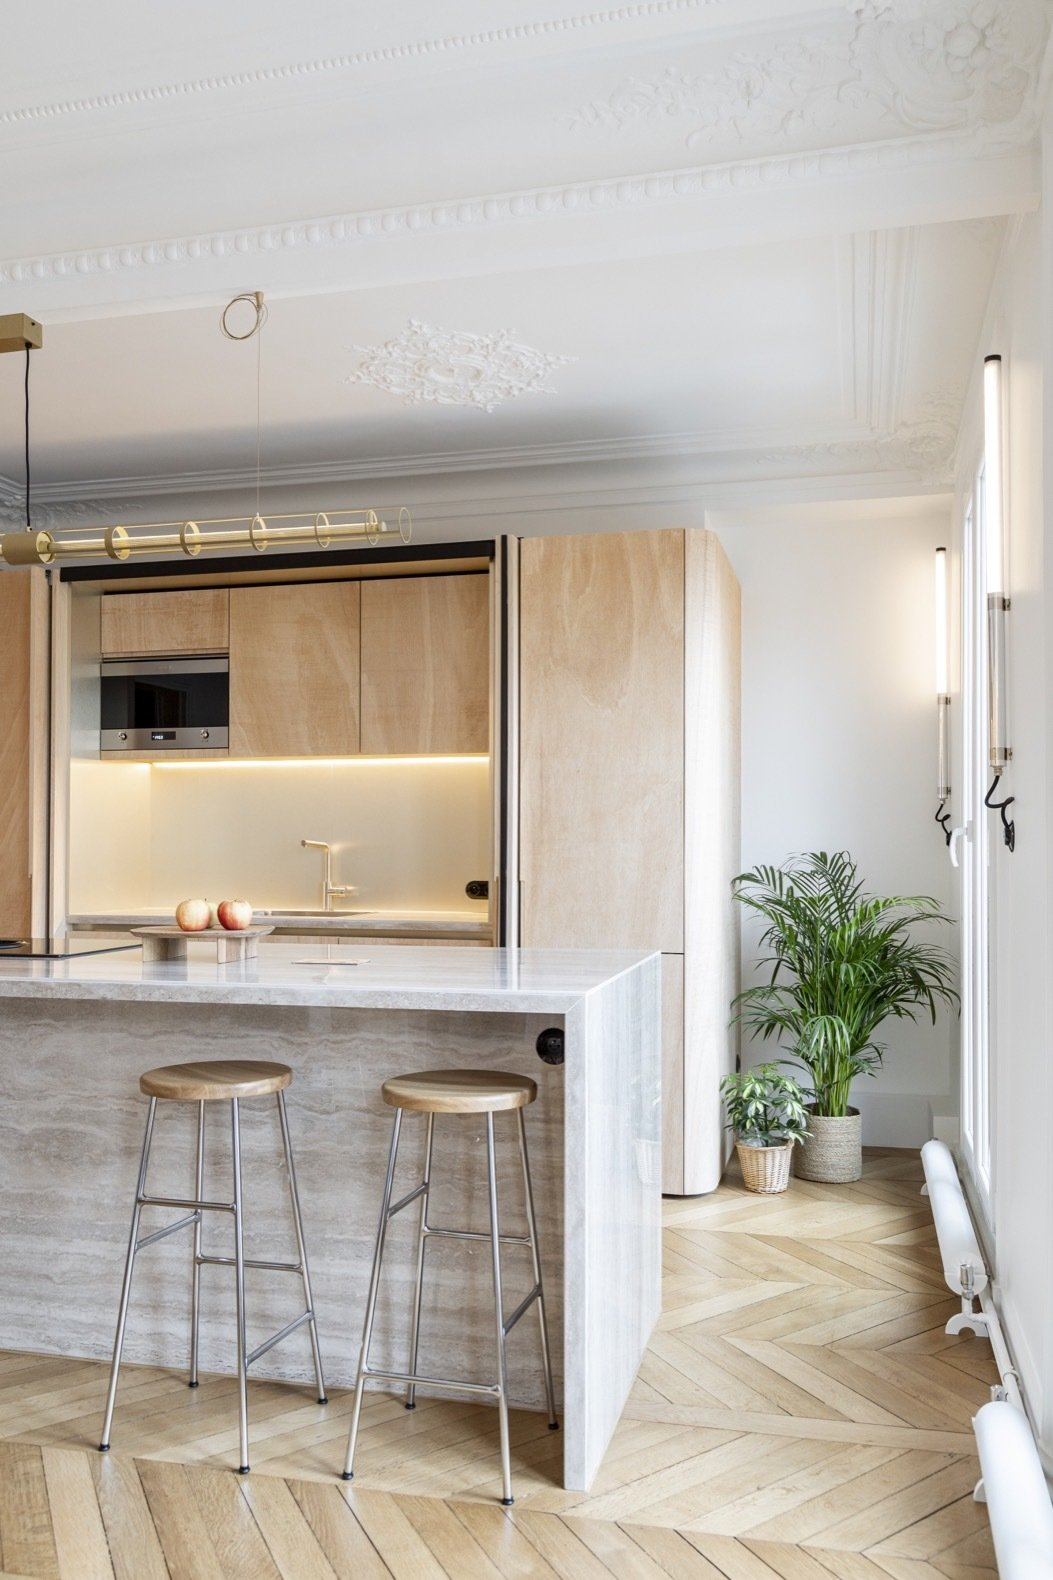 Wood Ribbon in Paris Apartment kitchen